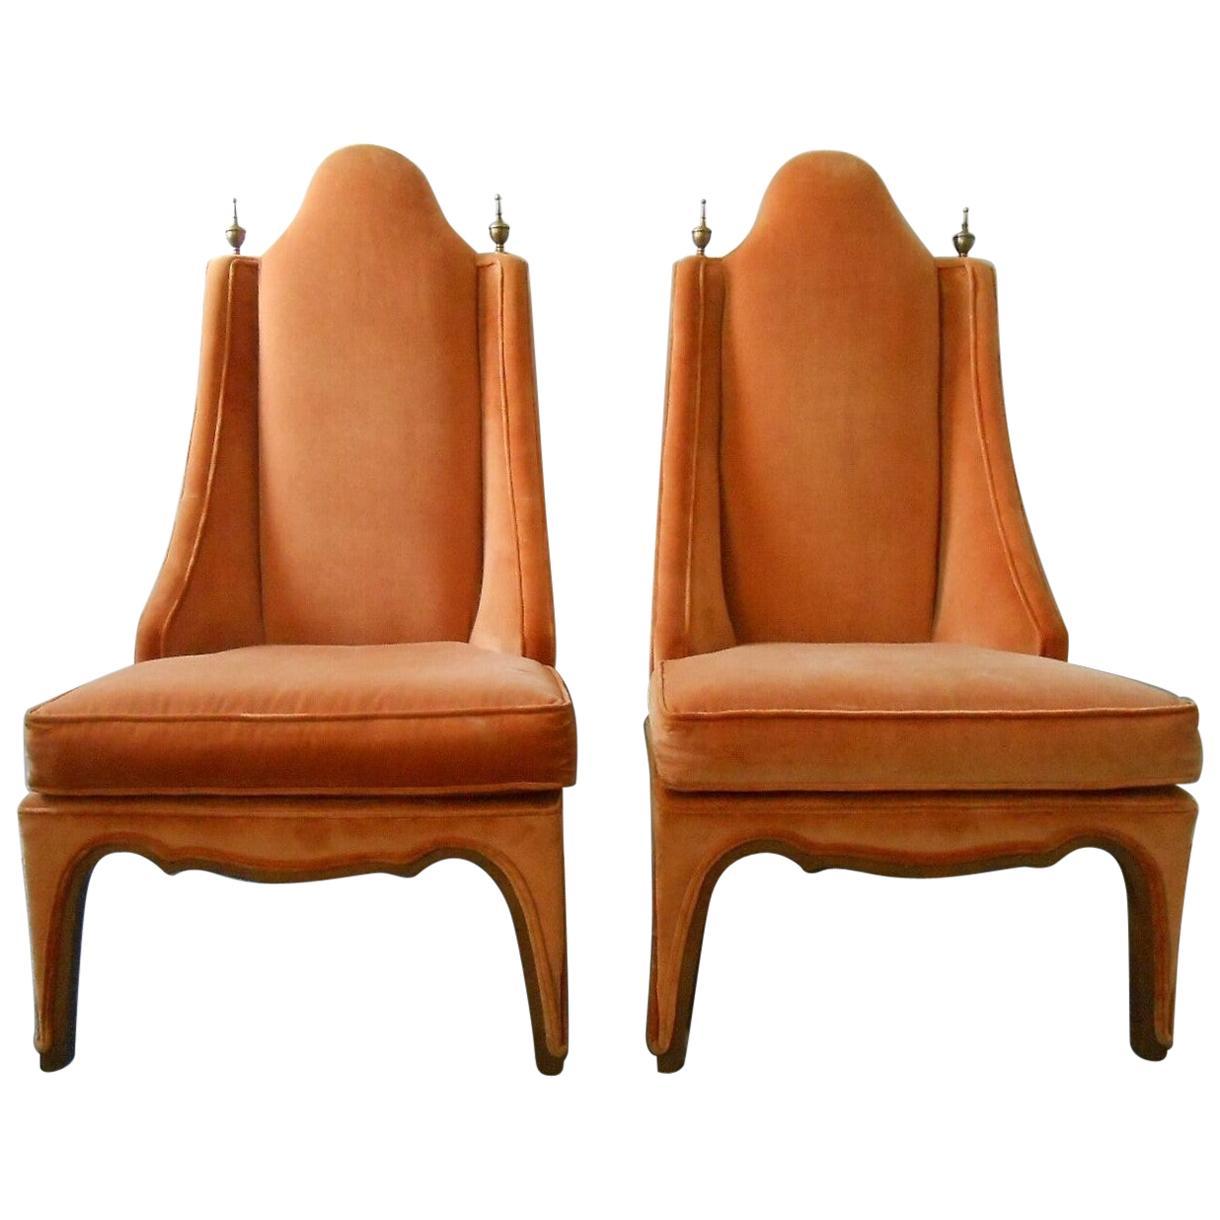 1960s Pair of Hollywood Regency Slipper Chairs in Orange with Wood Trim